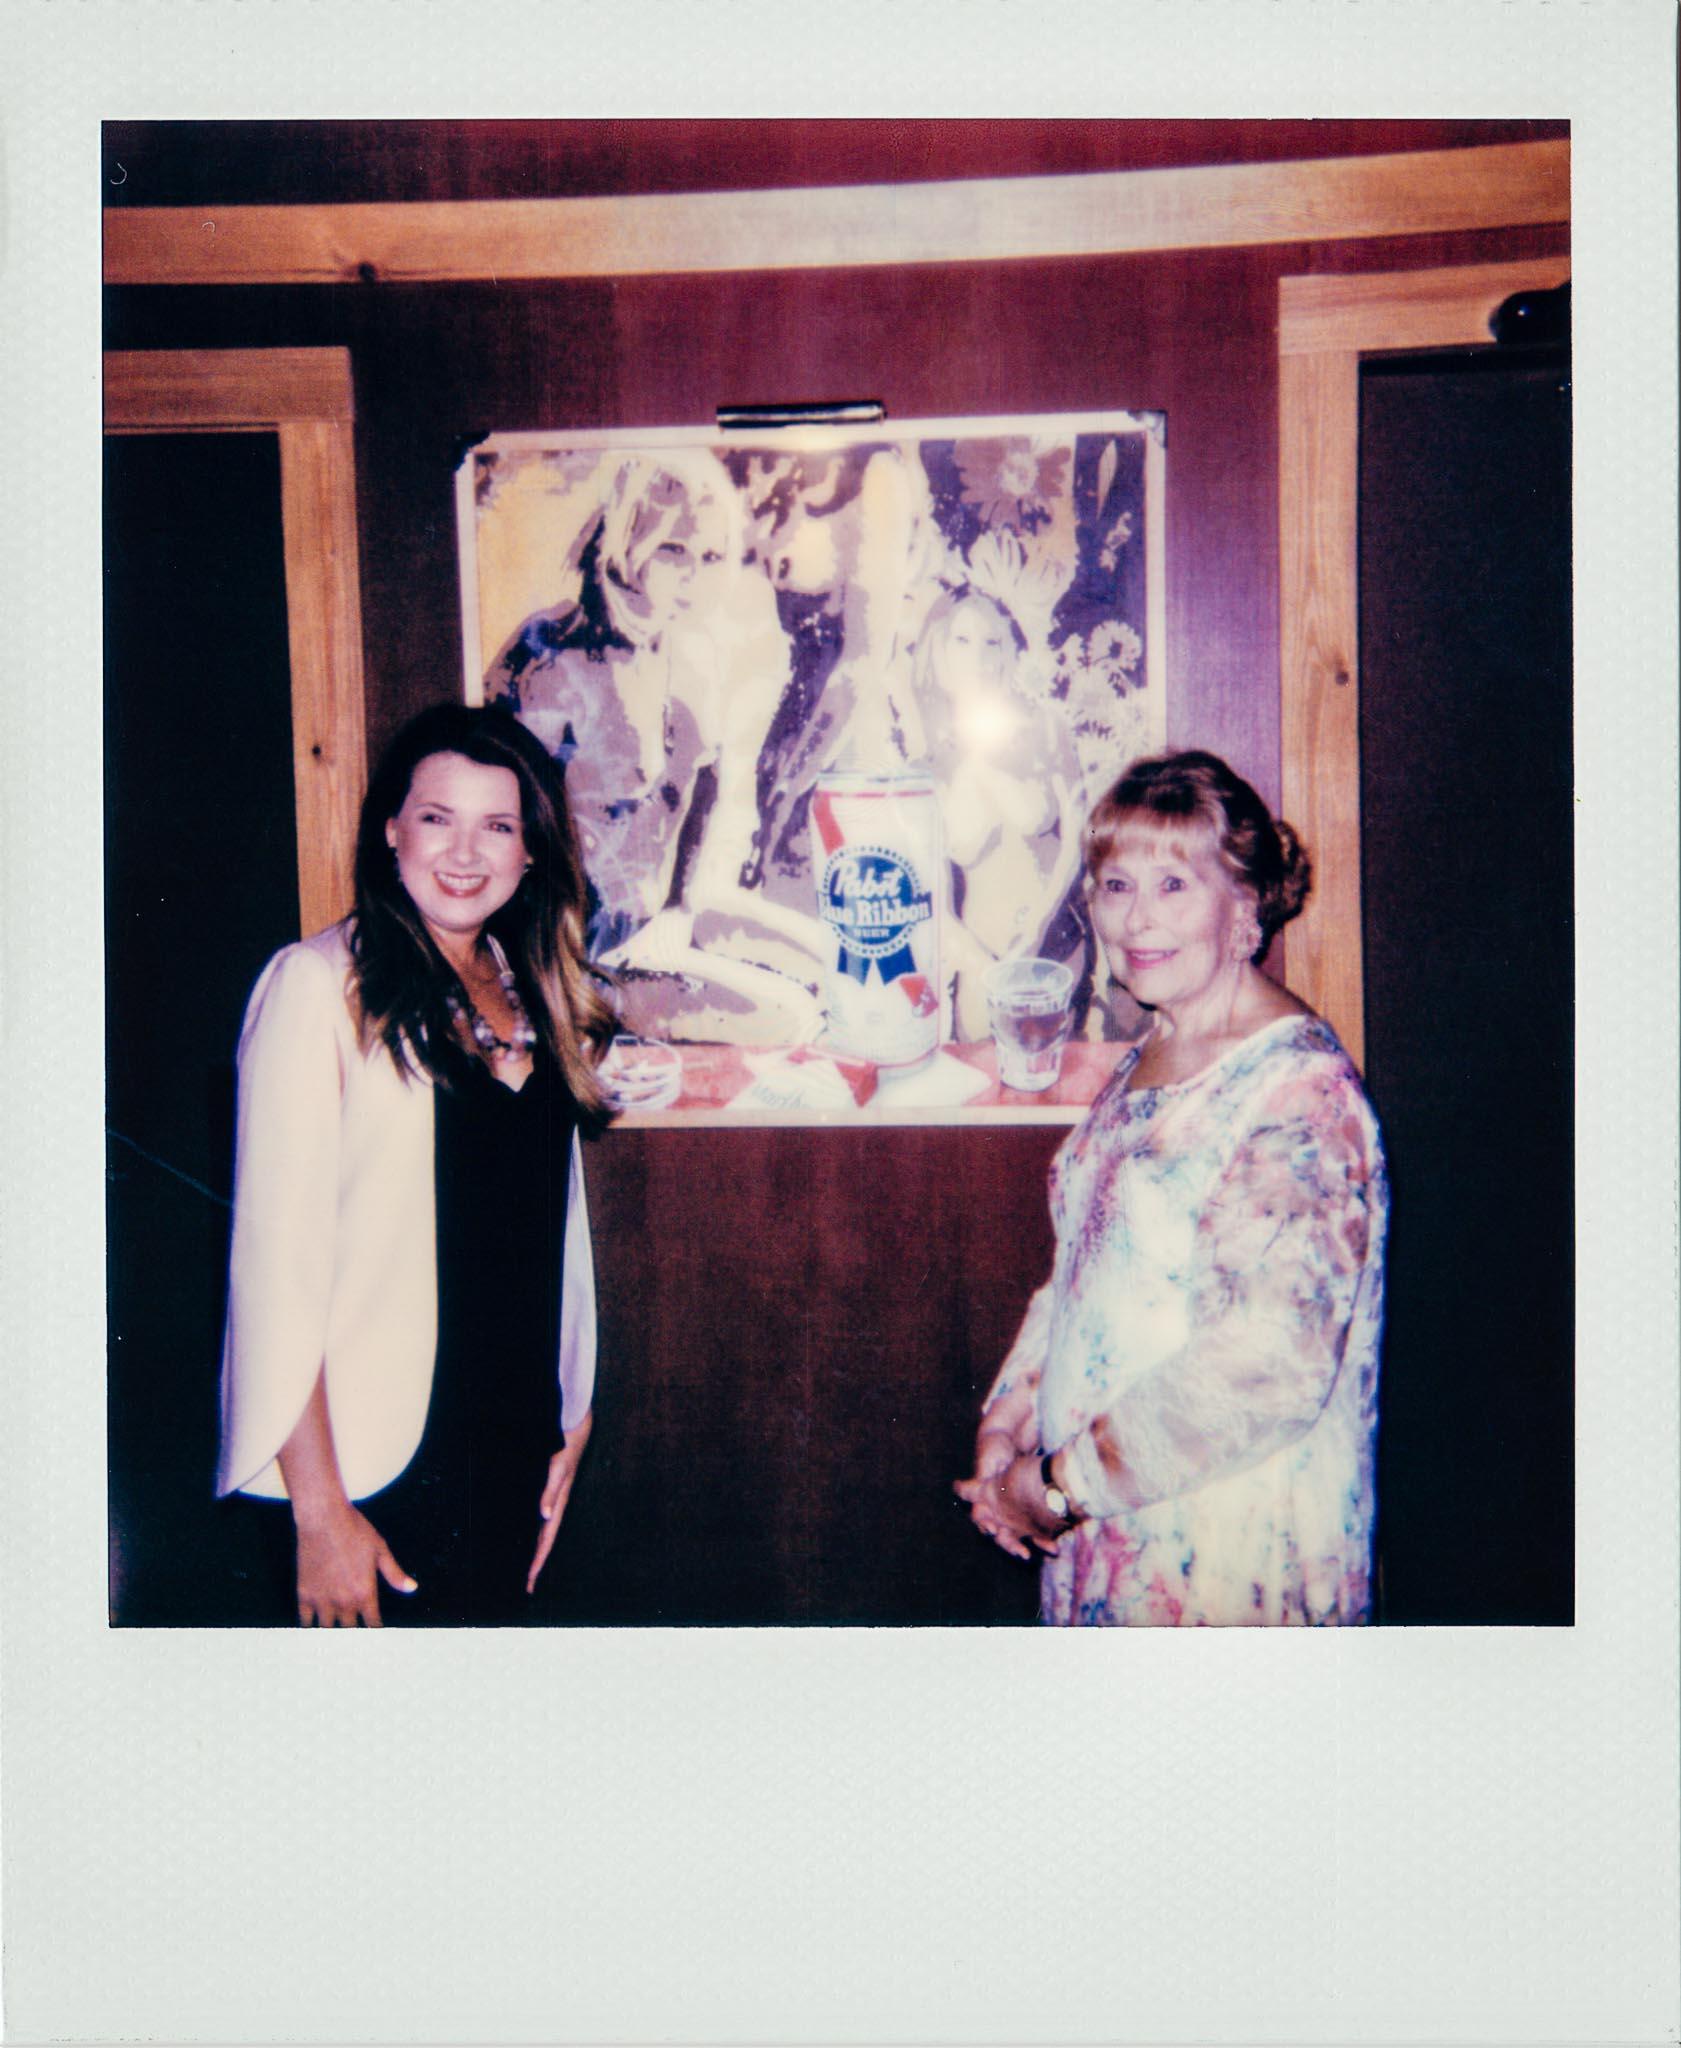 Linda Updike and Lauren Ferriola posing in front of Wallys Nude Wall paper